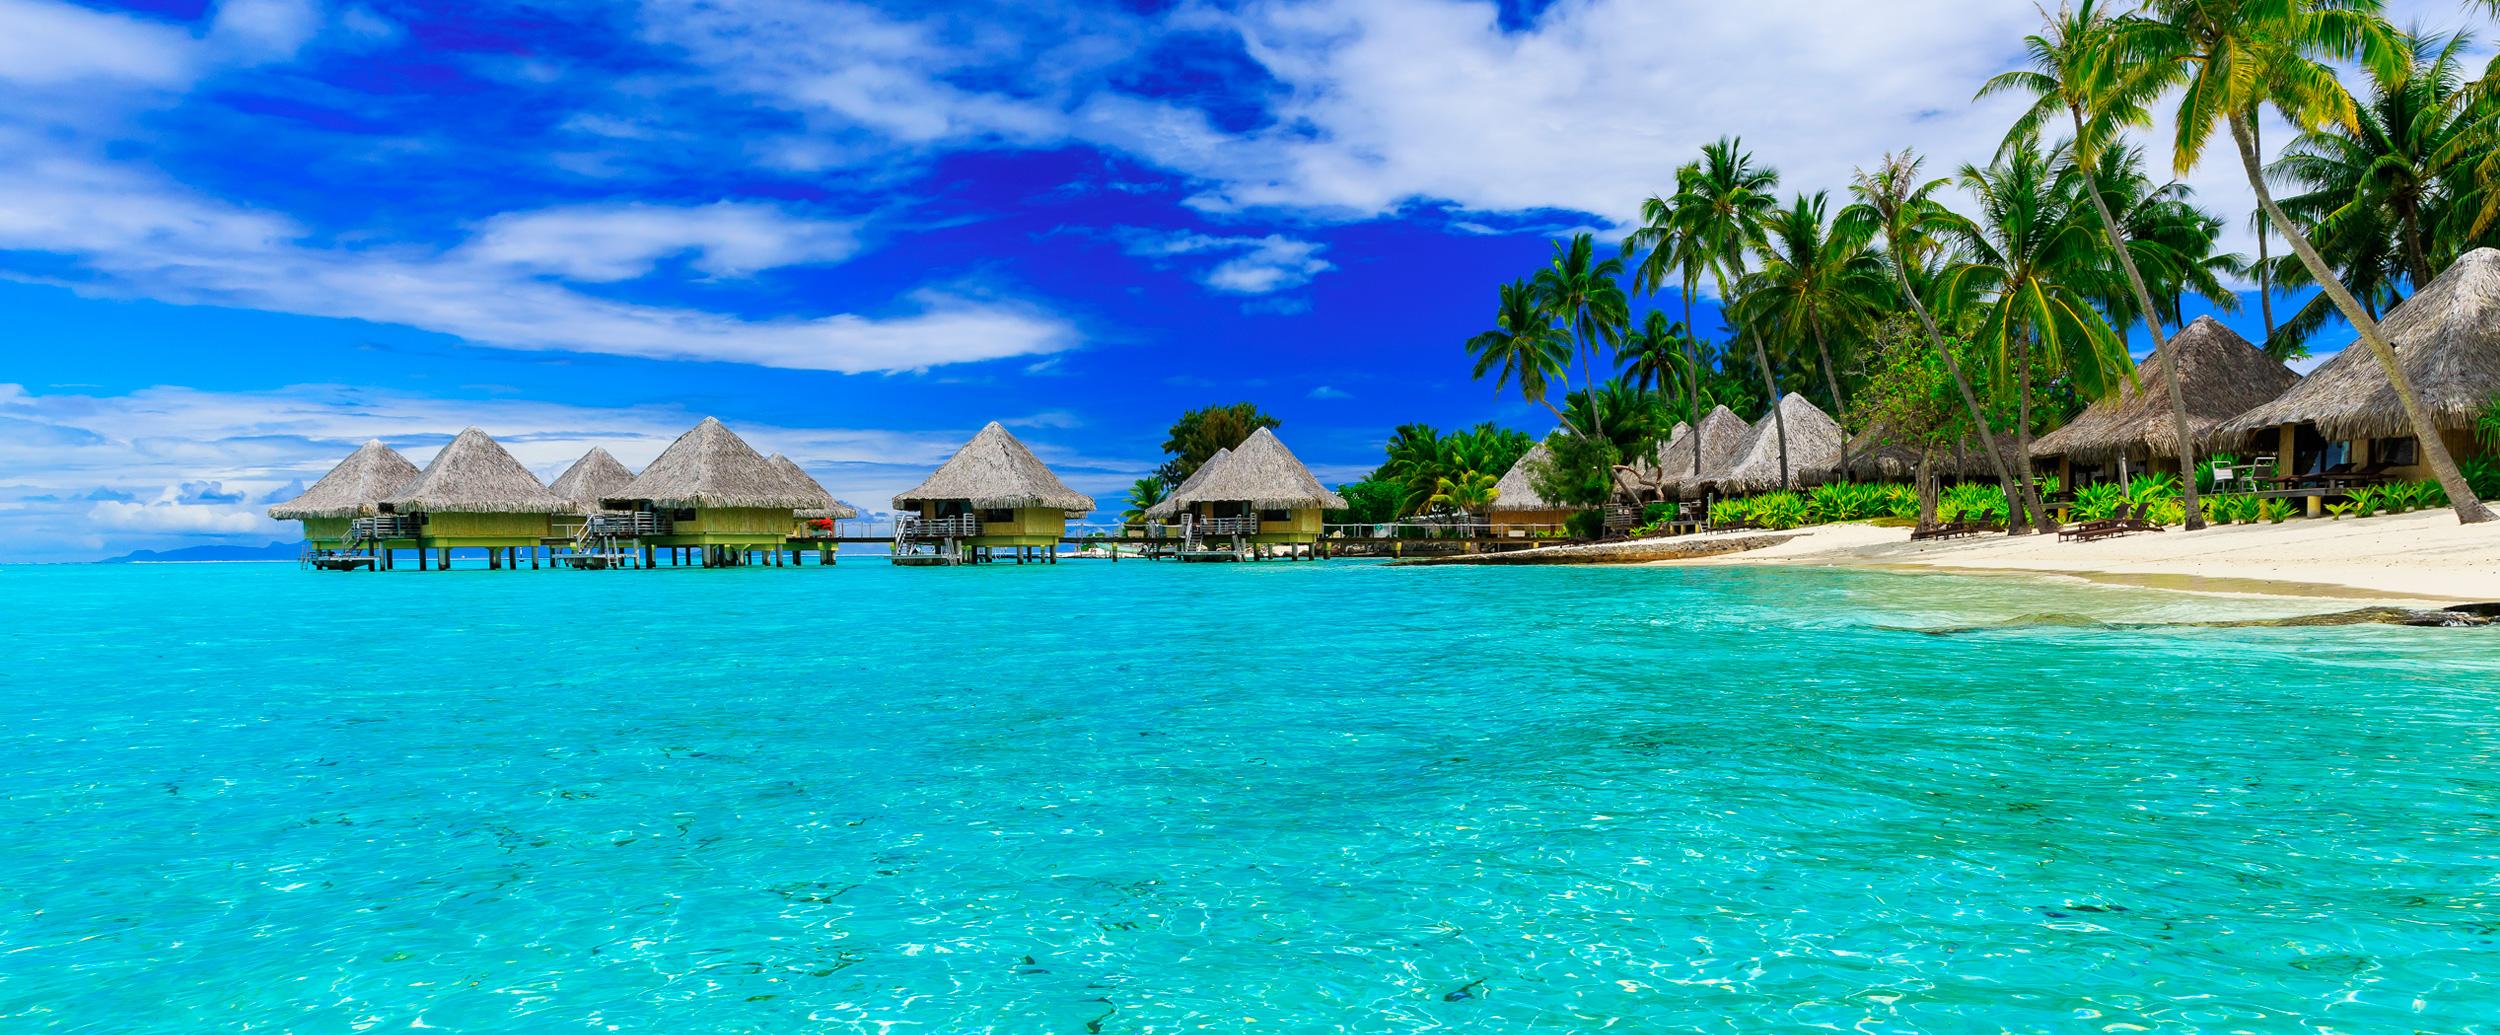 excursions tahiti iles sous le vent polyn sie fran aise payer en plusieurs fois magiclub. Black Bedroom Furniture Sets. Home Design Ideas